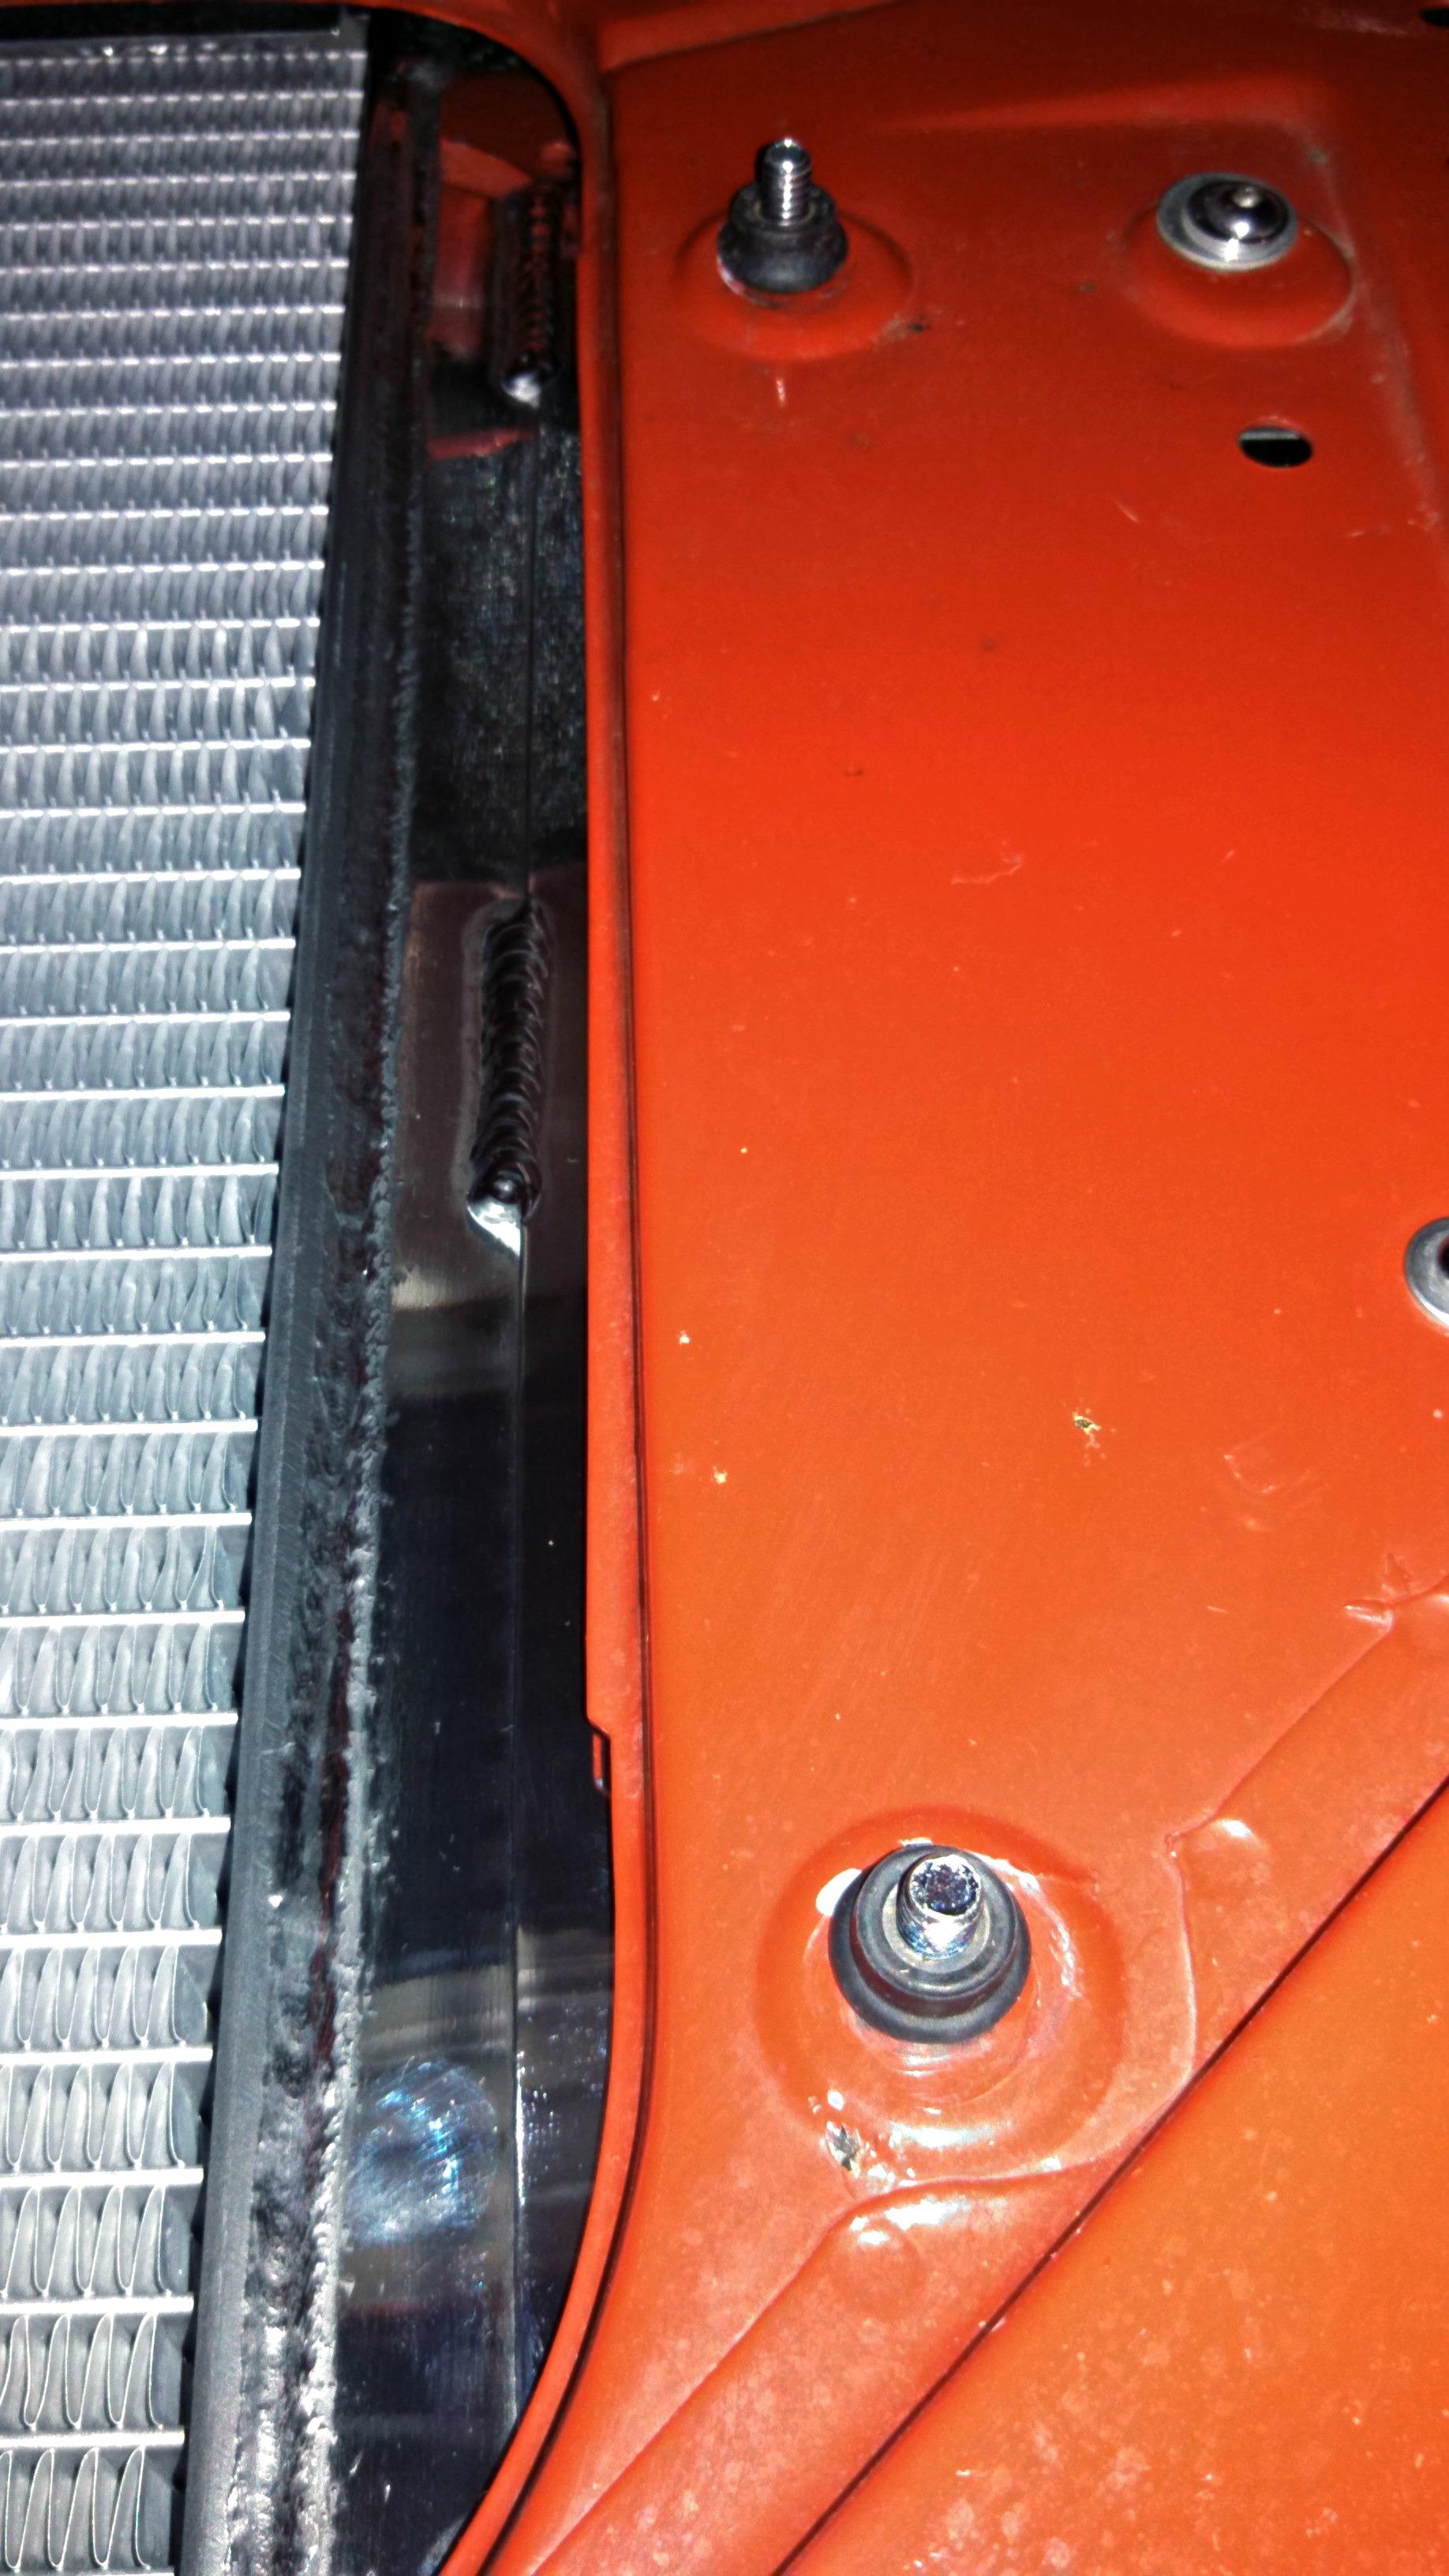 67 Camaro radiator isolator mount installation complete